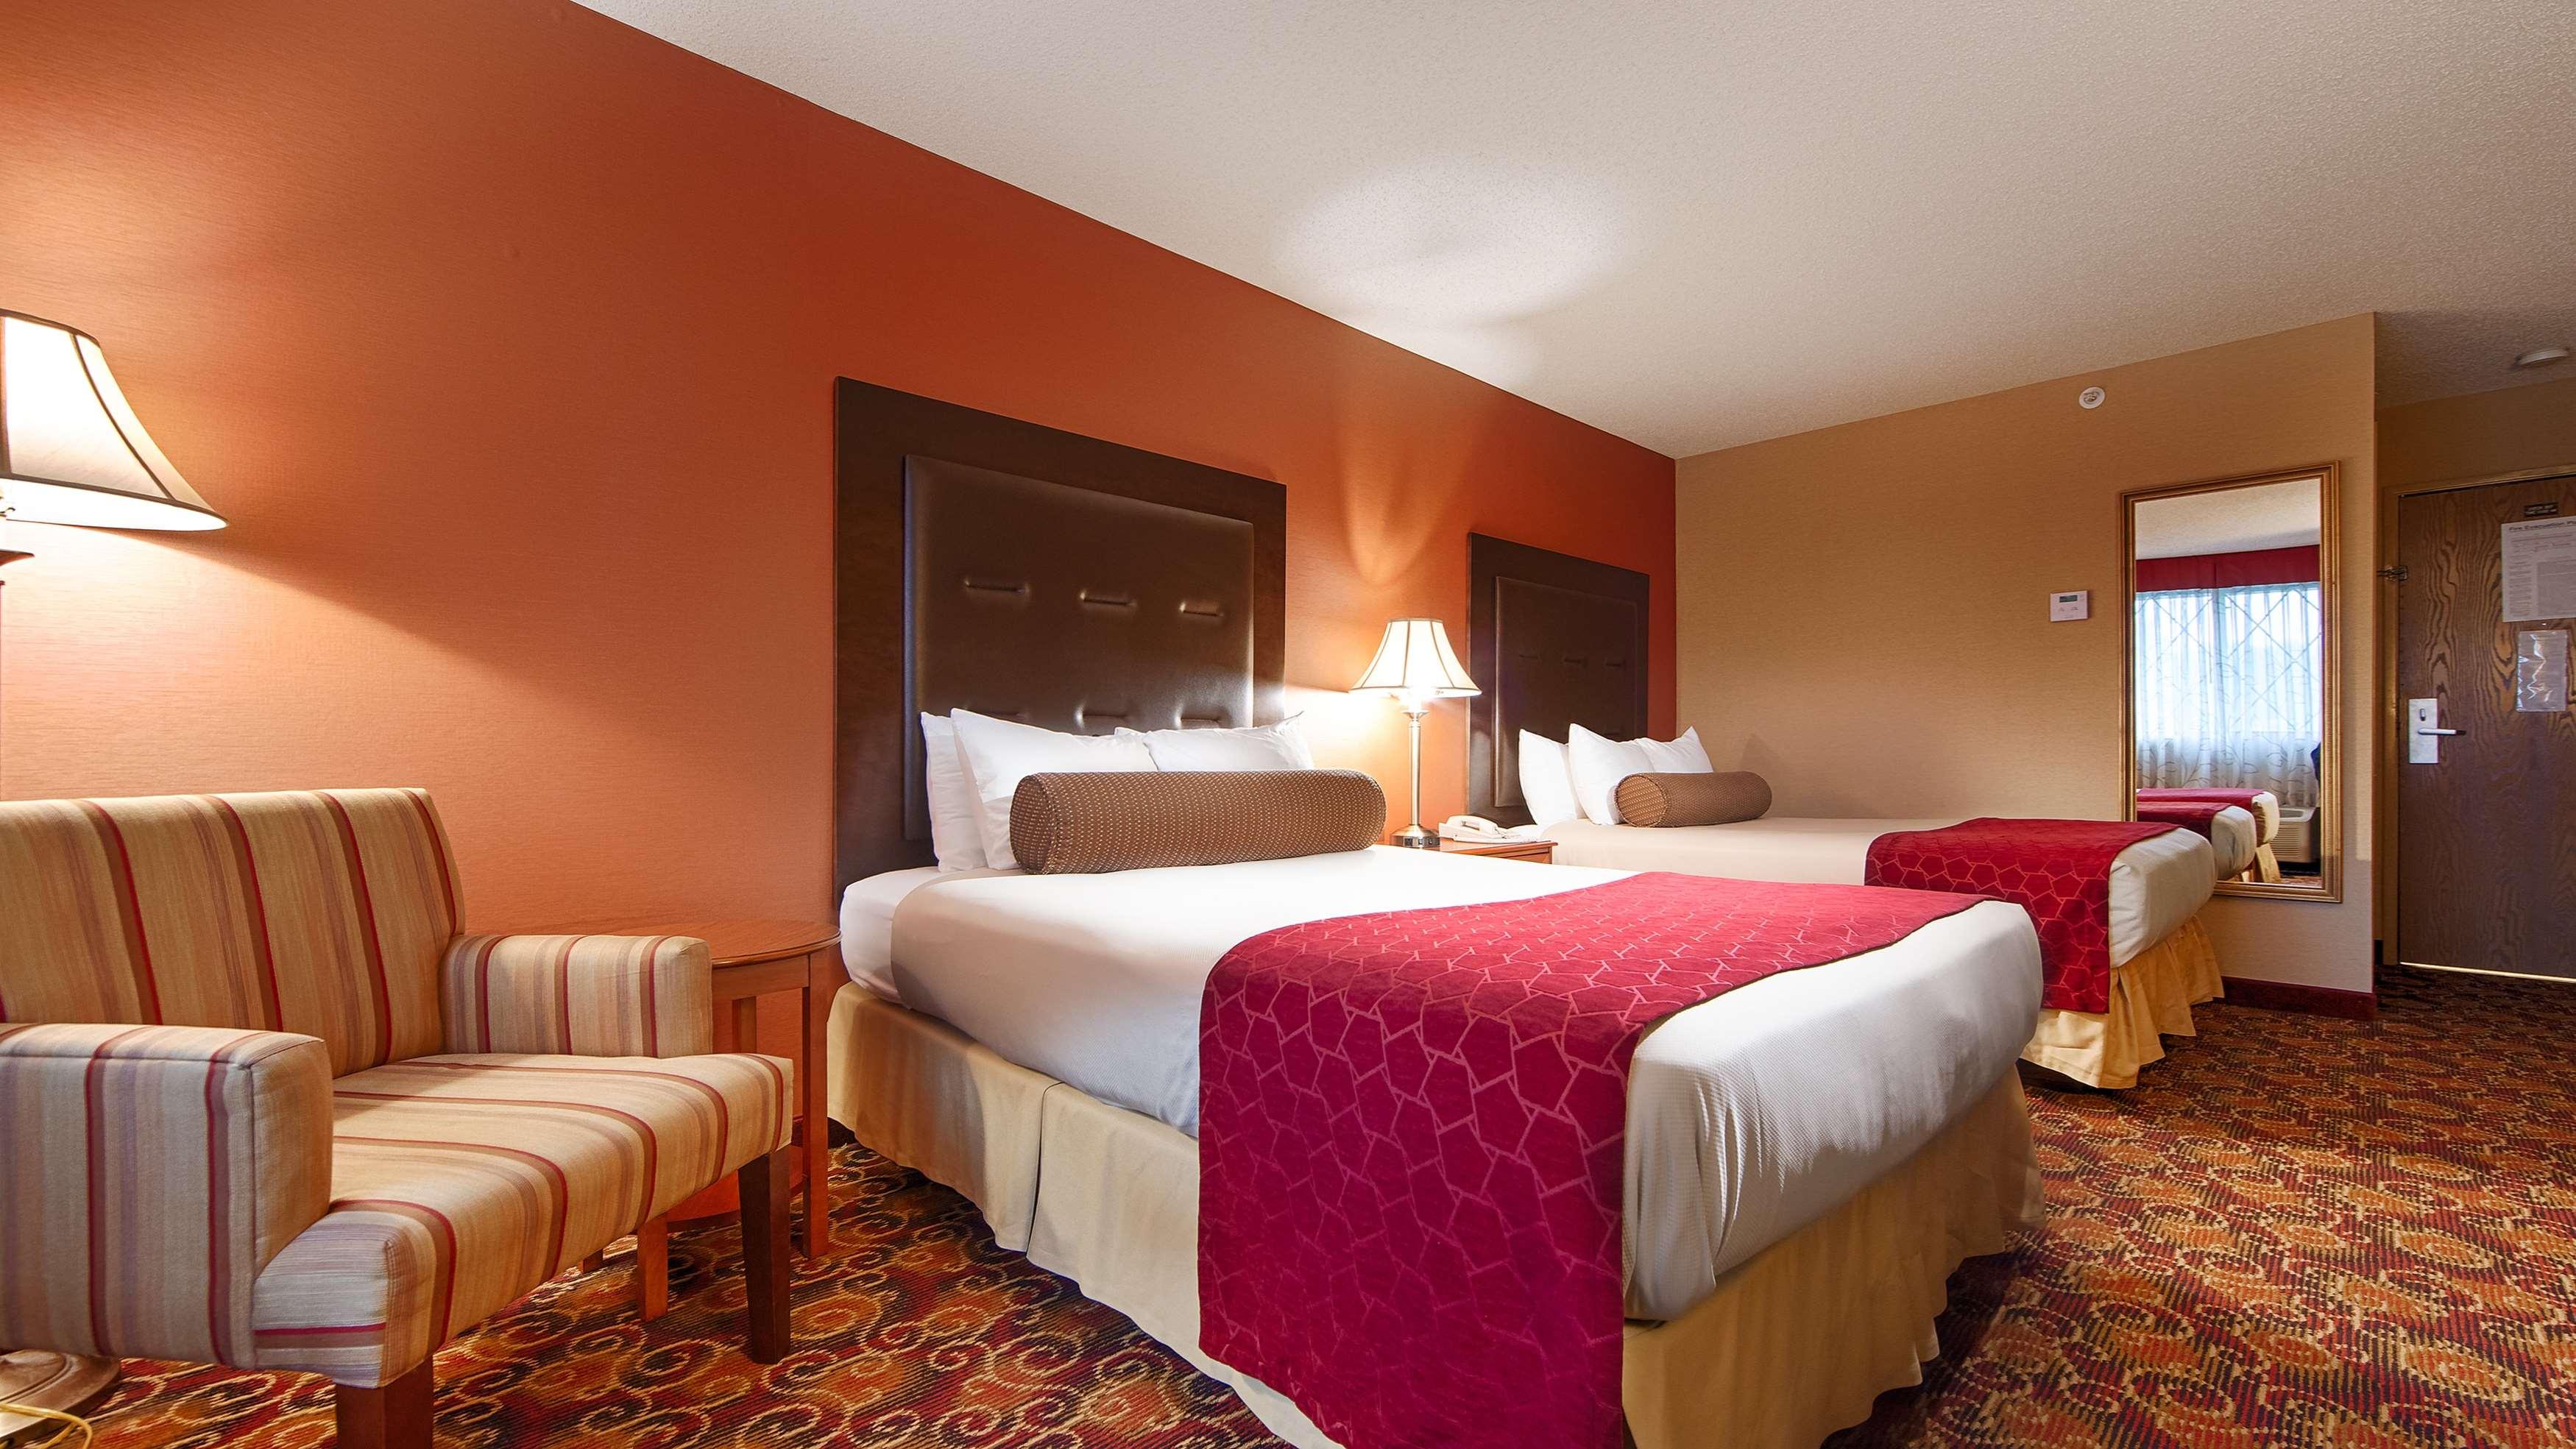 Best Western Plus The Inn at Sharon/Foxboro image 9